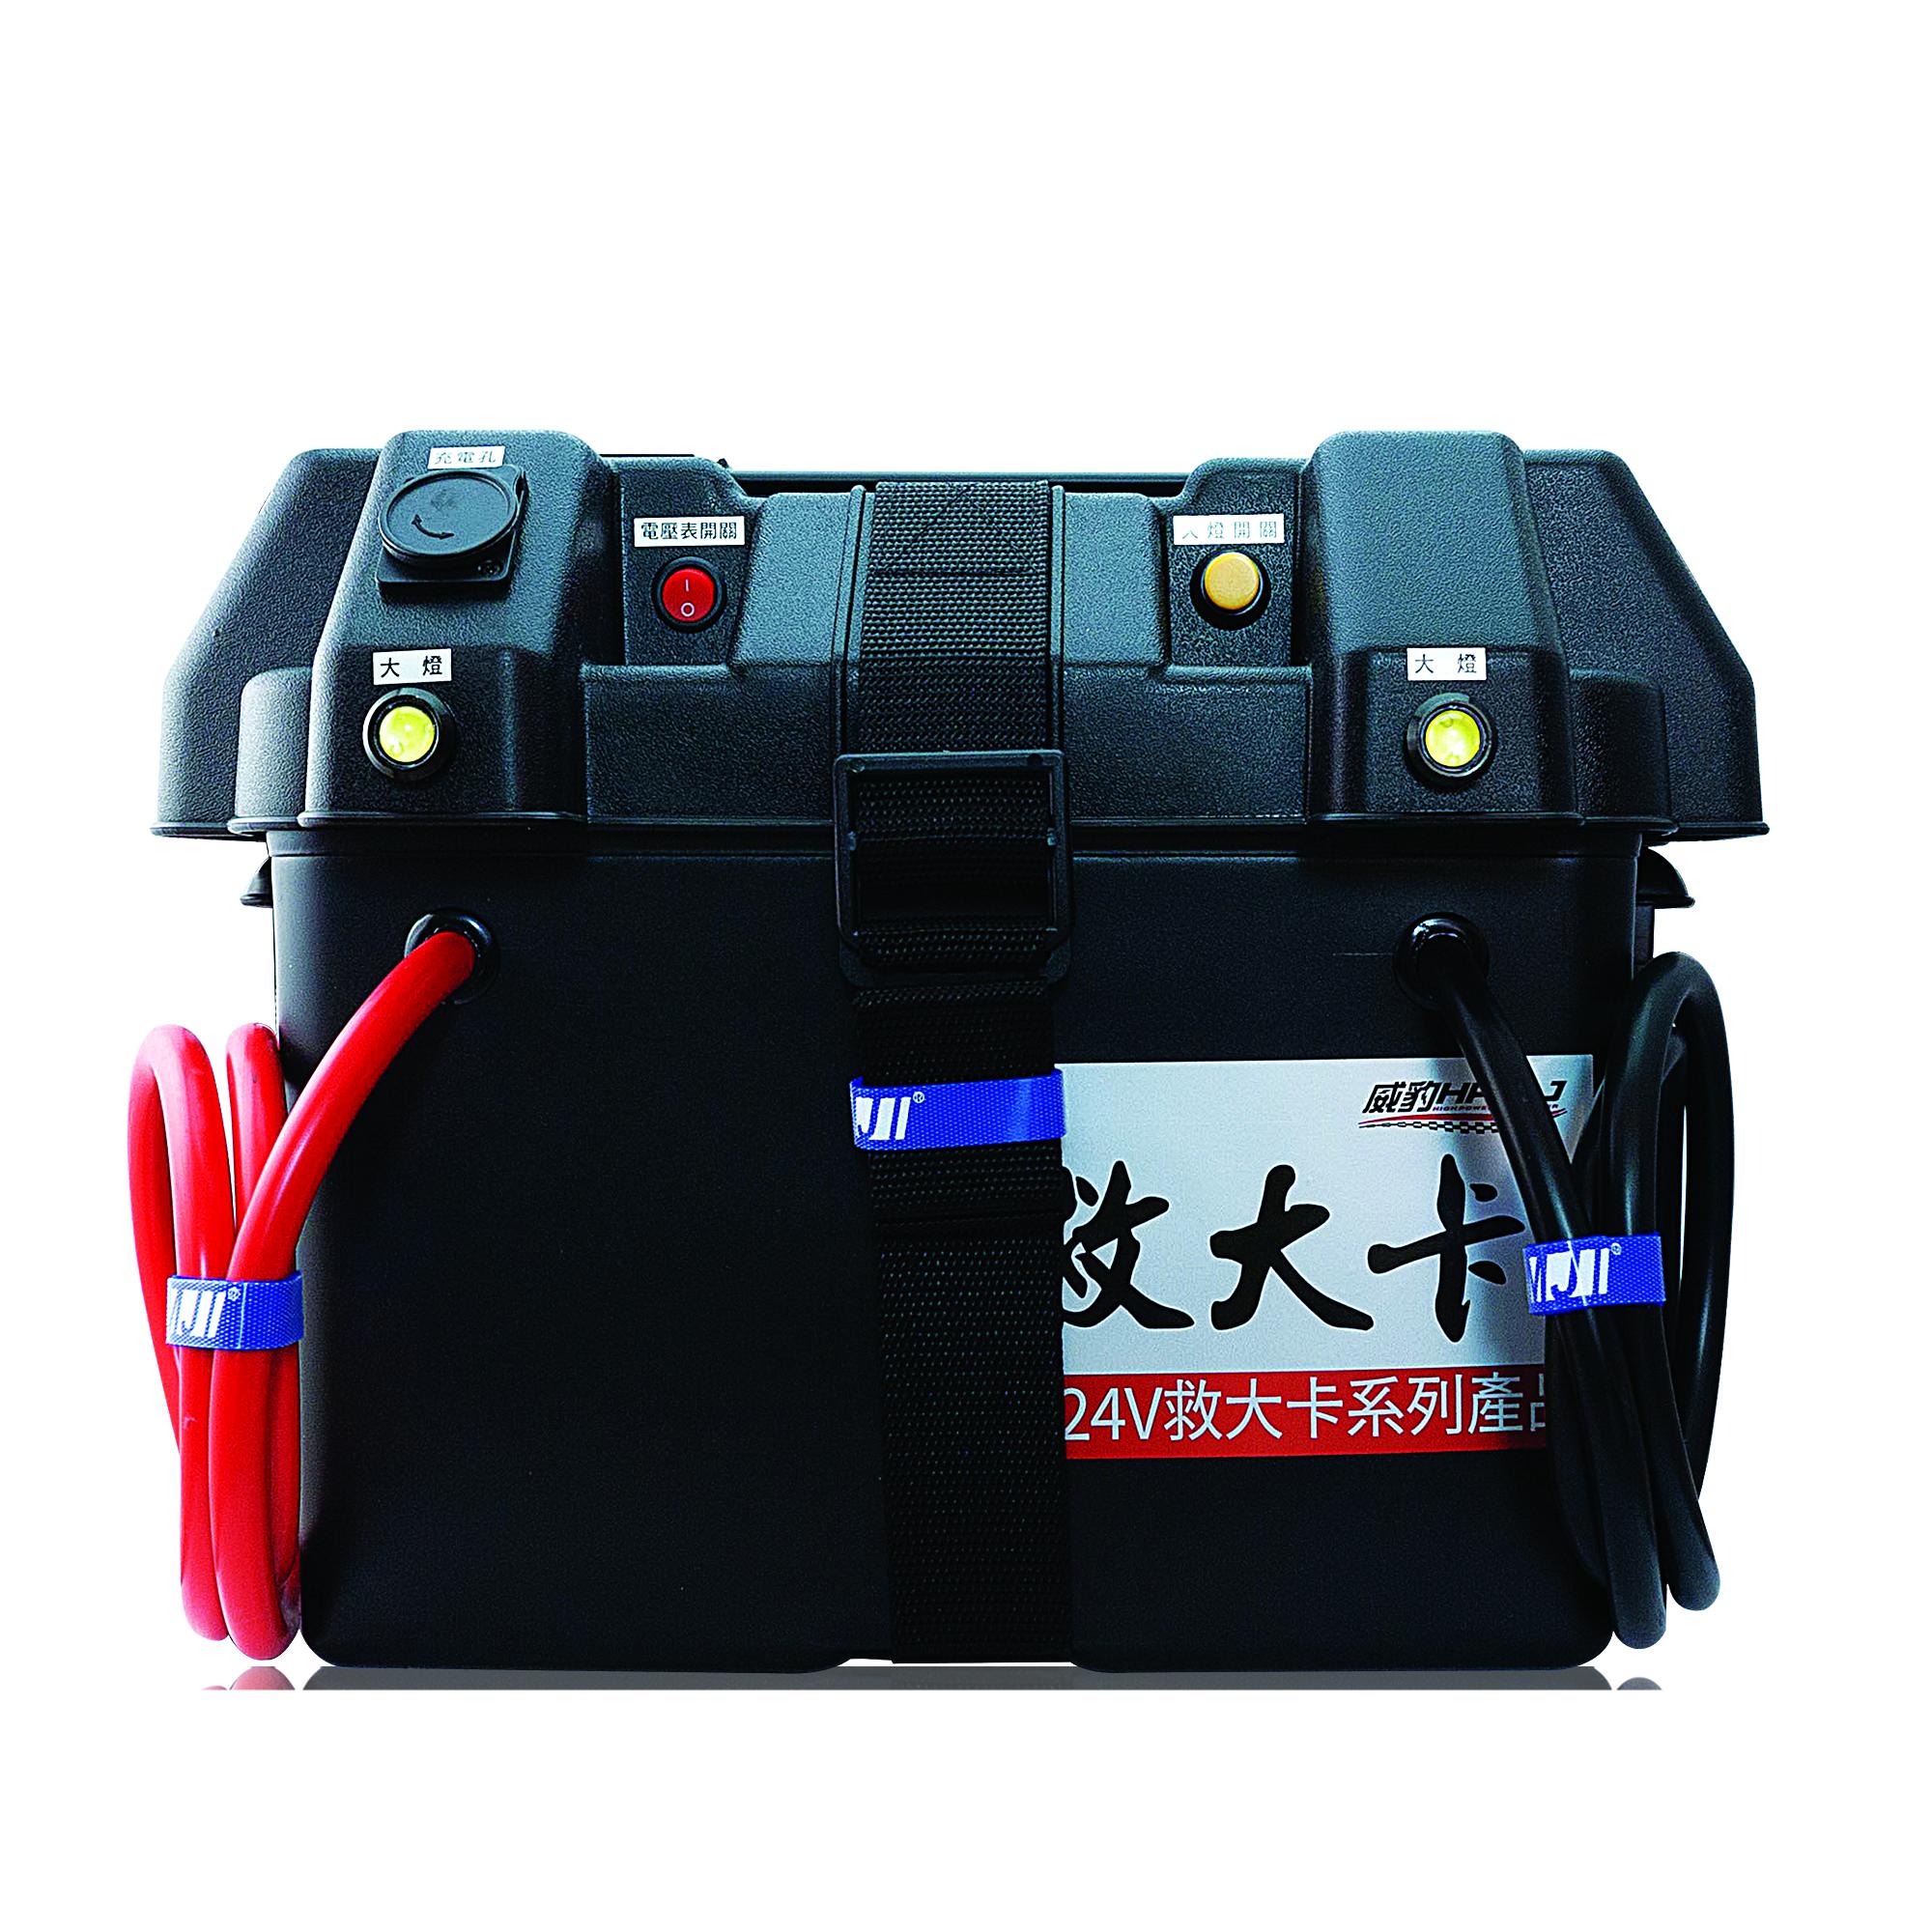 24V Heavy Duty Booster/Jump Starters/Emergency Car Starter/Emergency Power